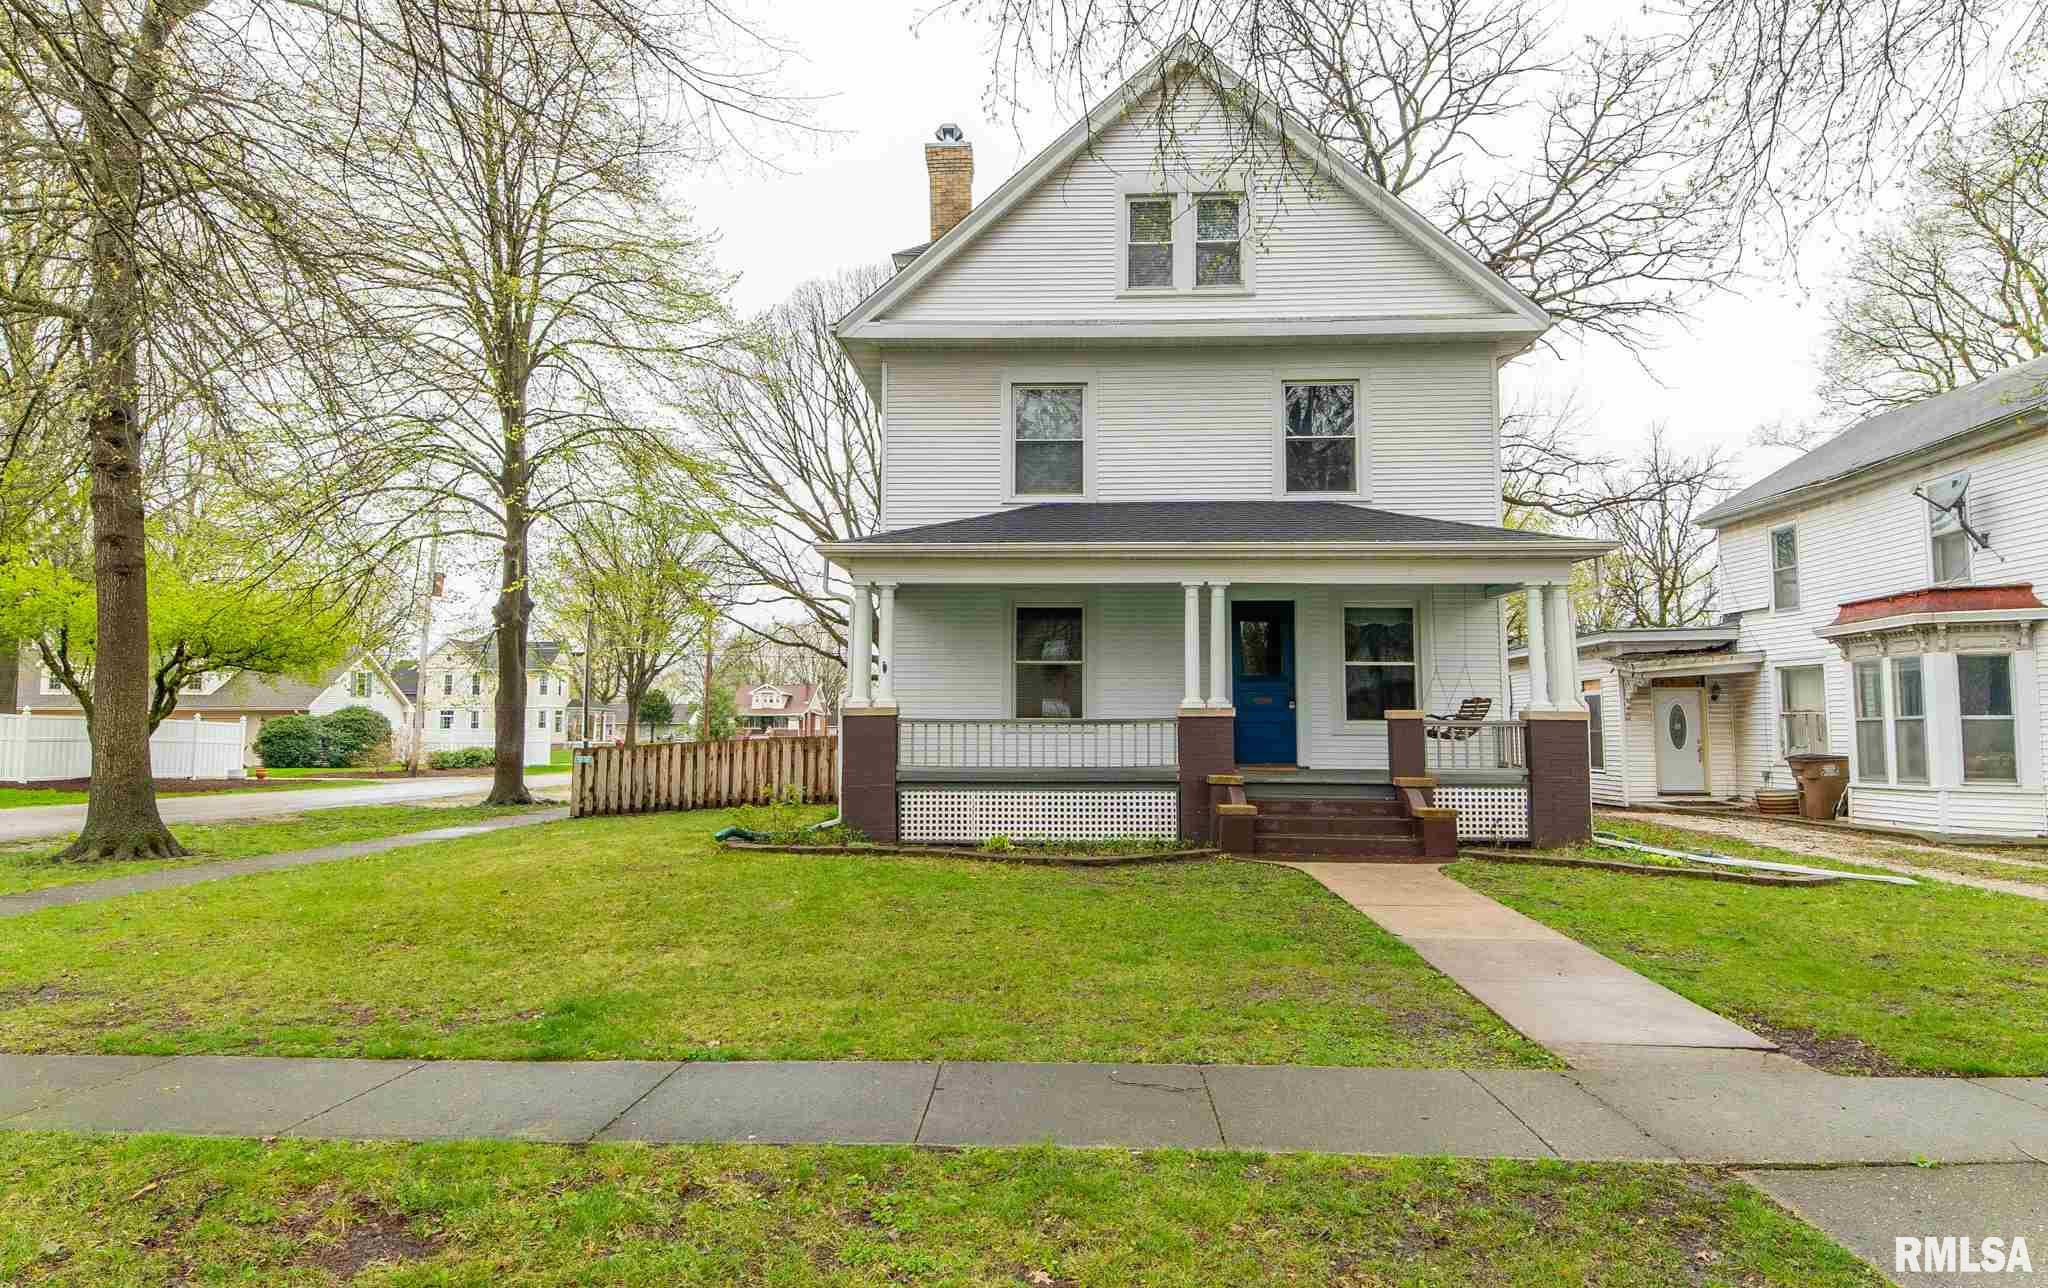 233 S BLAIR Property Photo - Virden, IL real estate listing